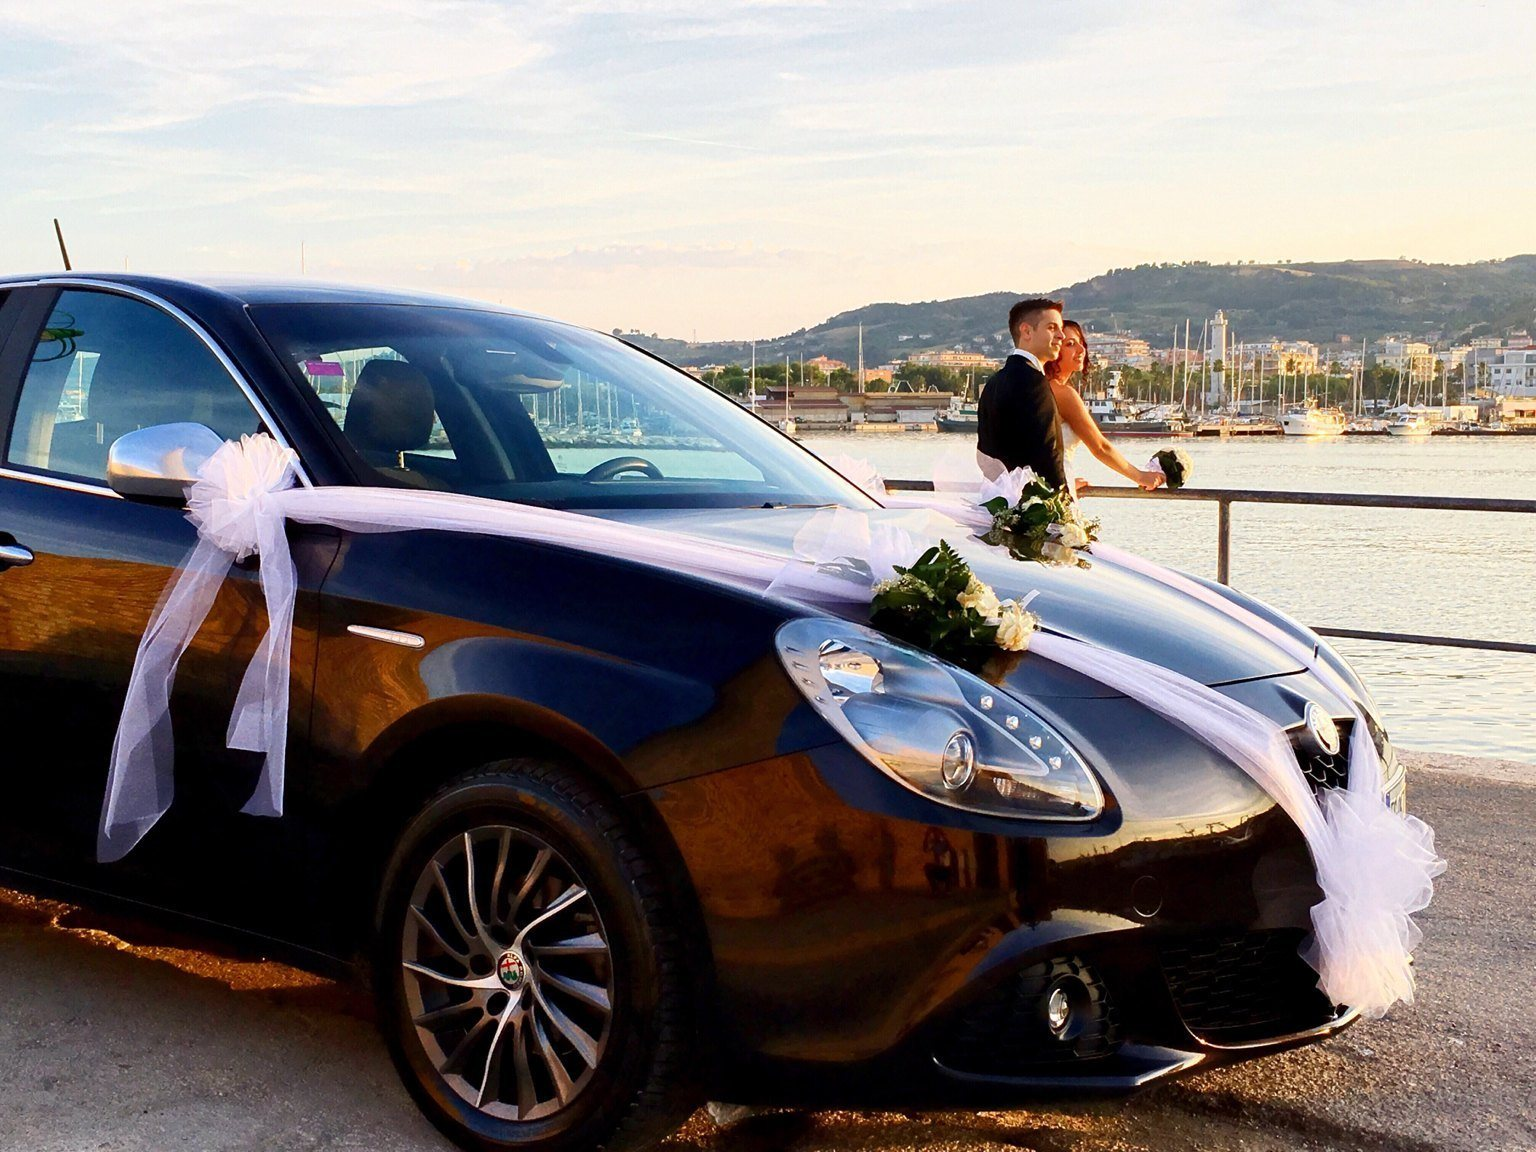 foto Matrimonio mio cognato - 1